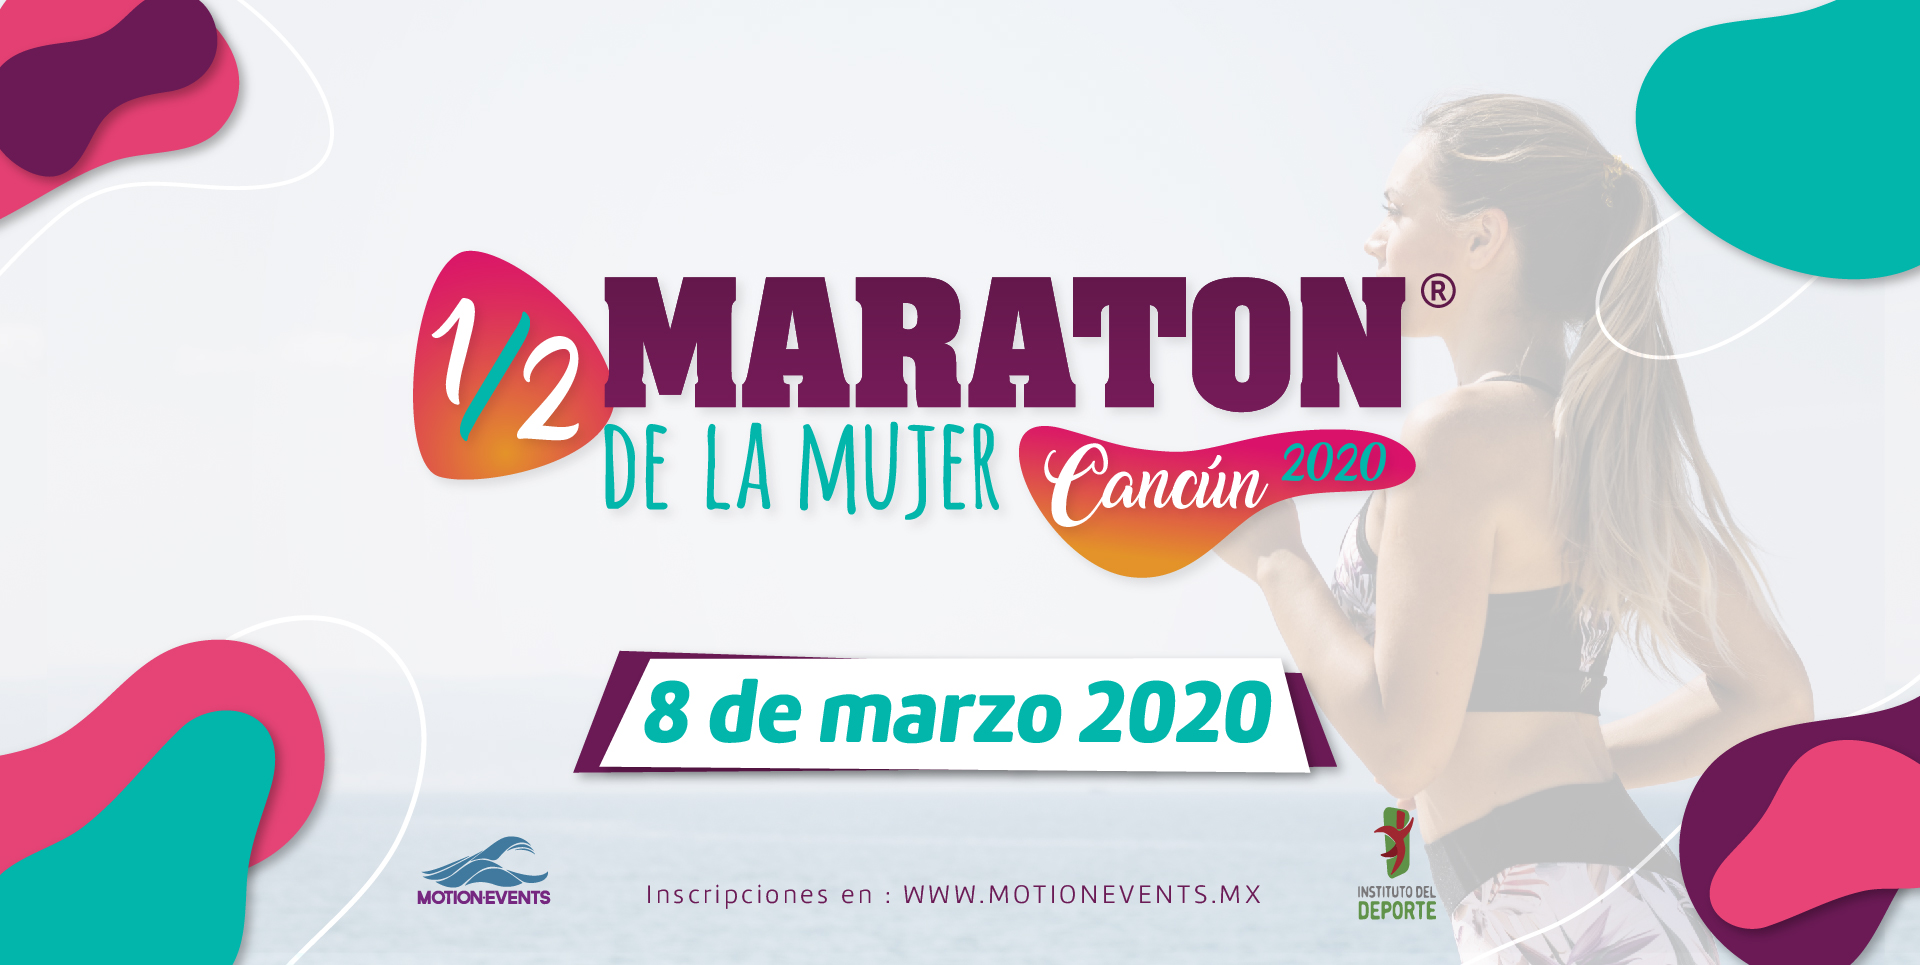 Carrera Para La Mujer Medio Maraton 2020